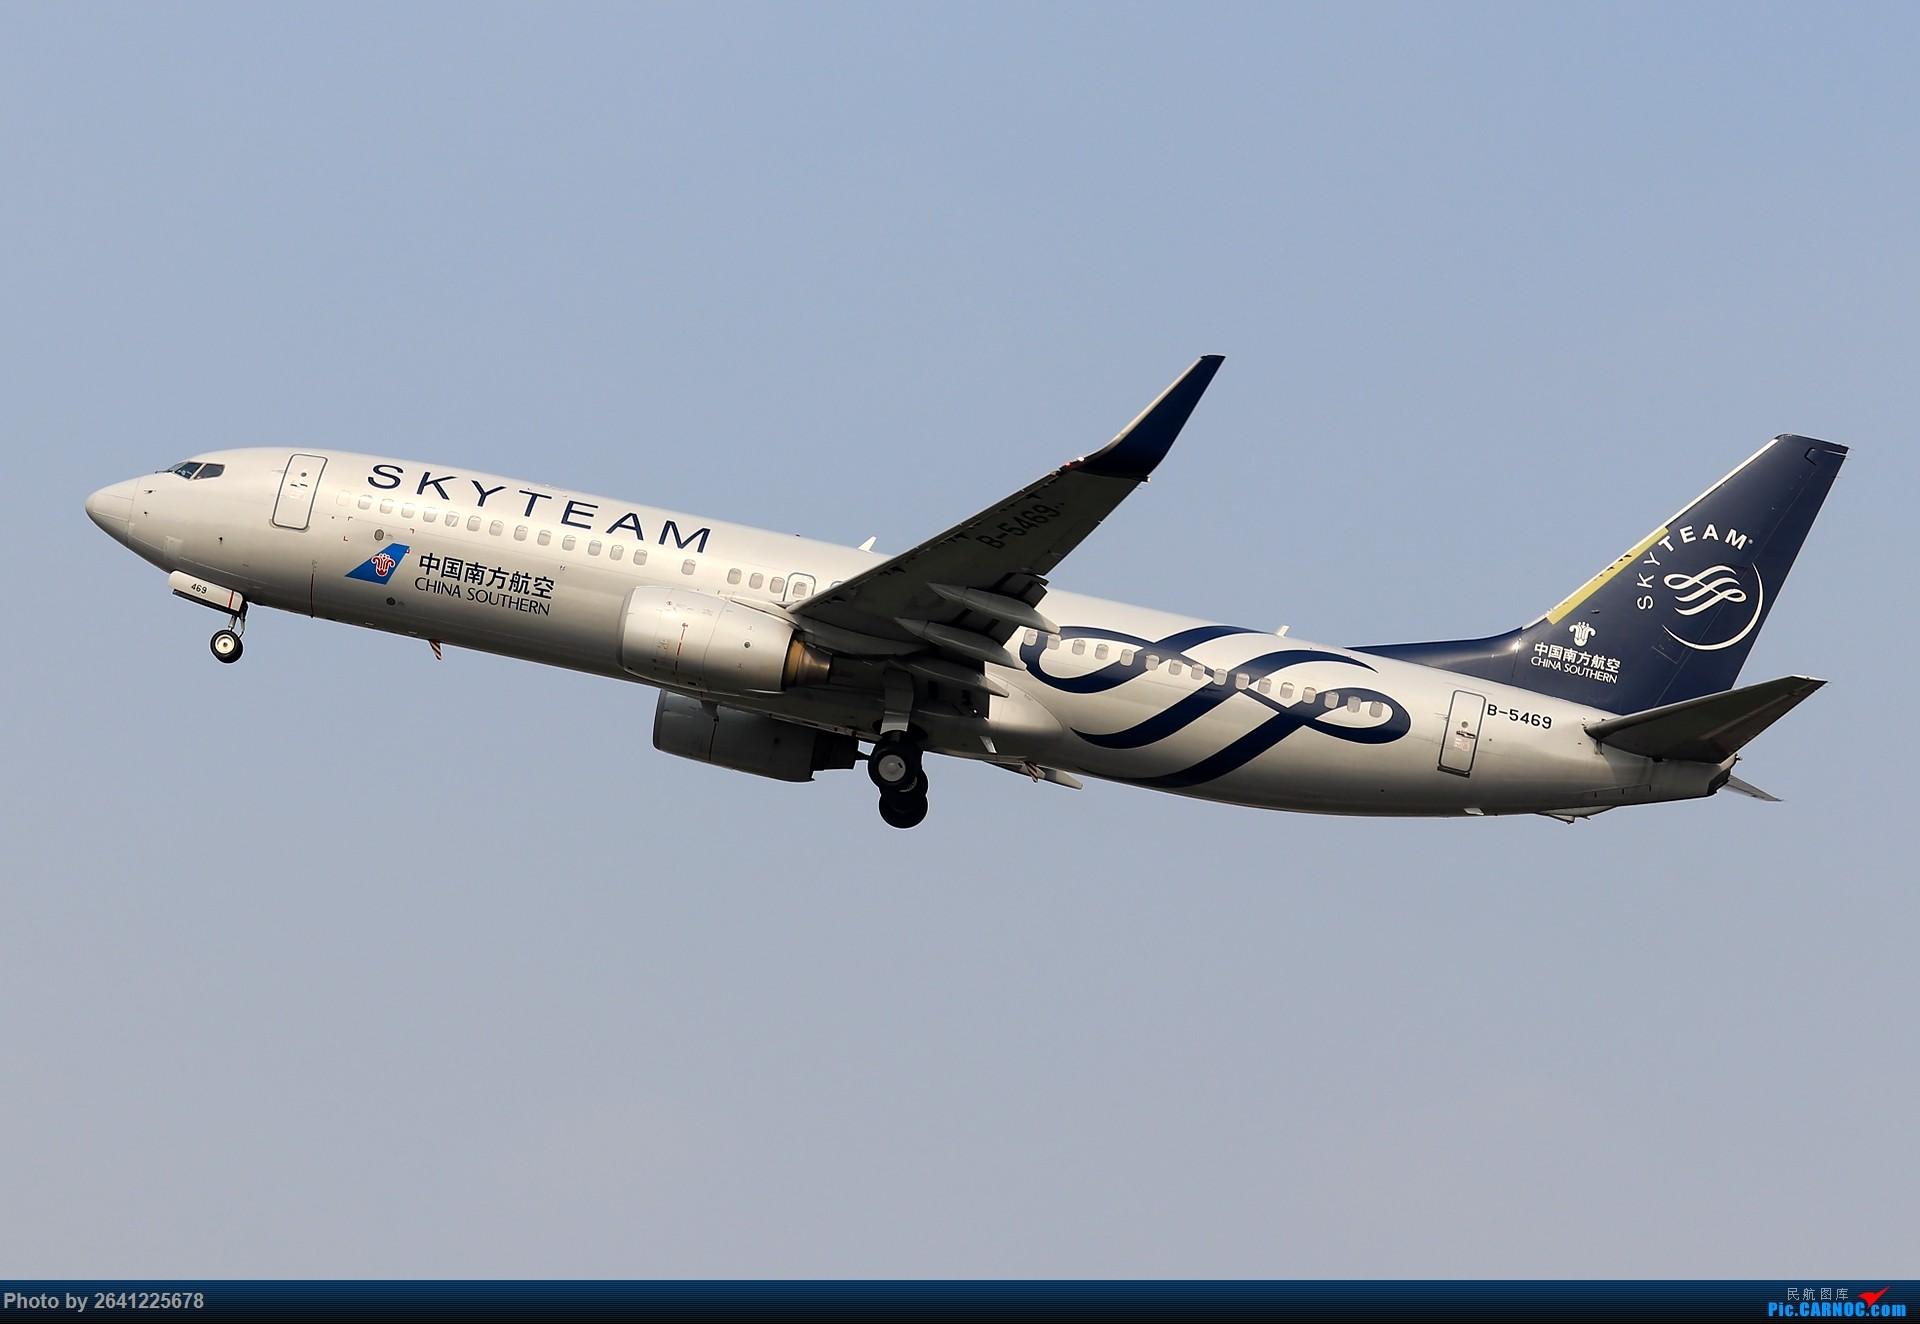 Re:[原创]【TAMRON 156 G2+77D 持续更新中】*****试新机+新镜*****(烂天+地热+渣技术,望大佬多多包涵) BOEING 737-800 B-5469 中国北京首都国际机场